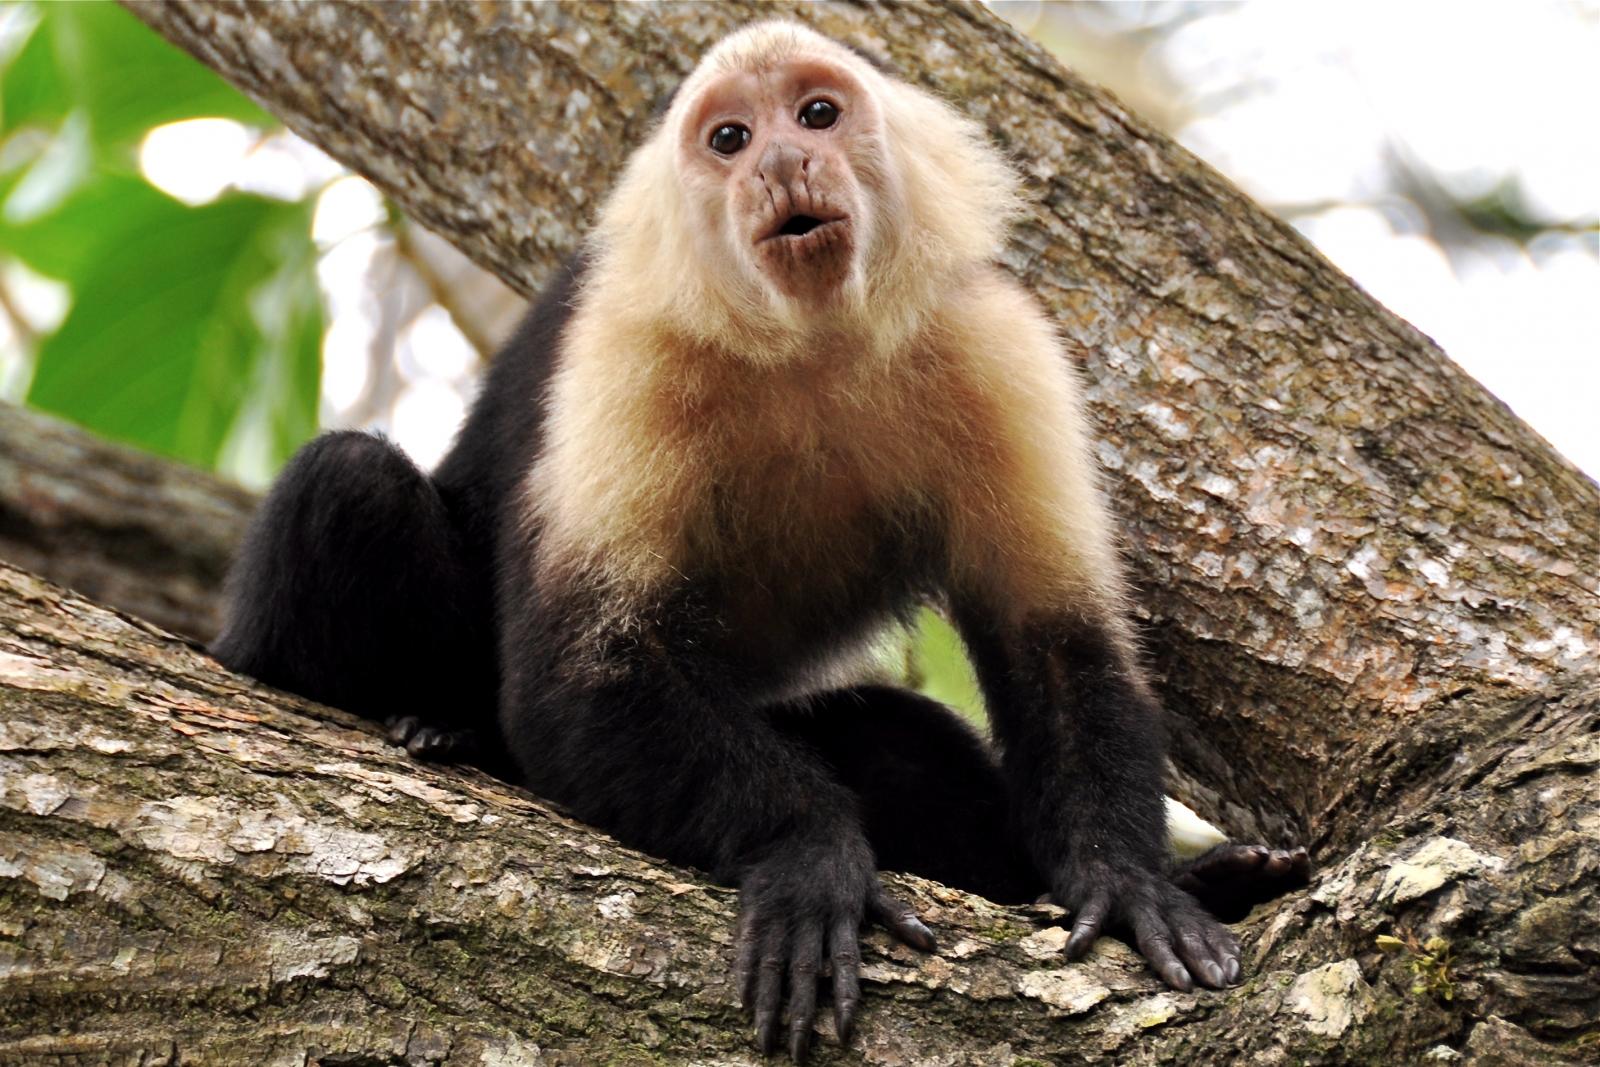 capuchin monkey stone tools